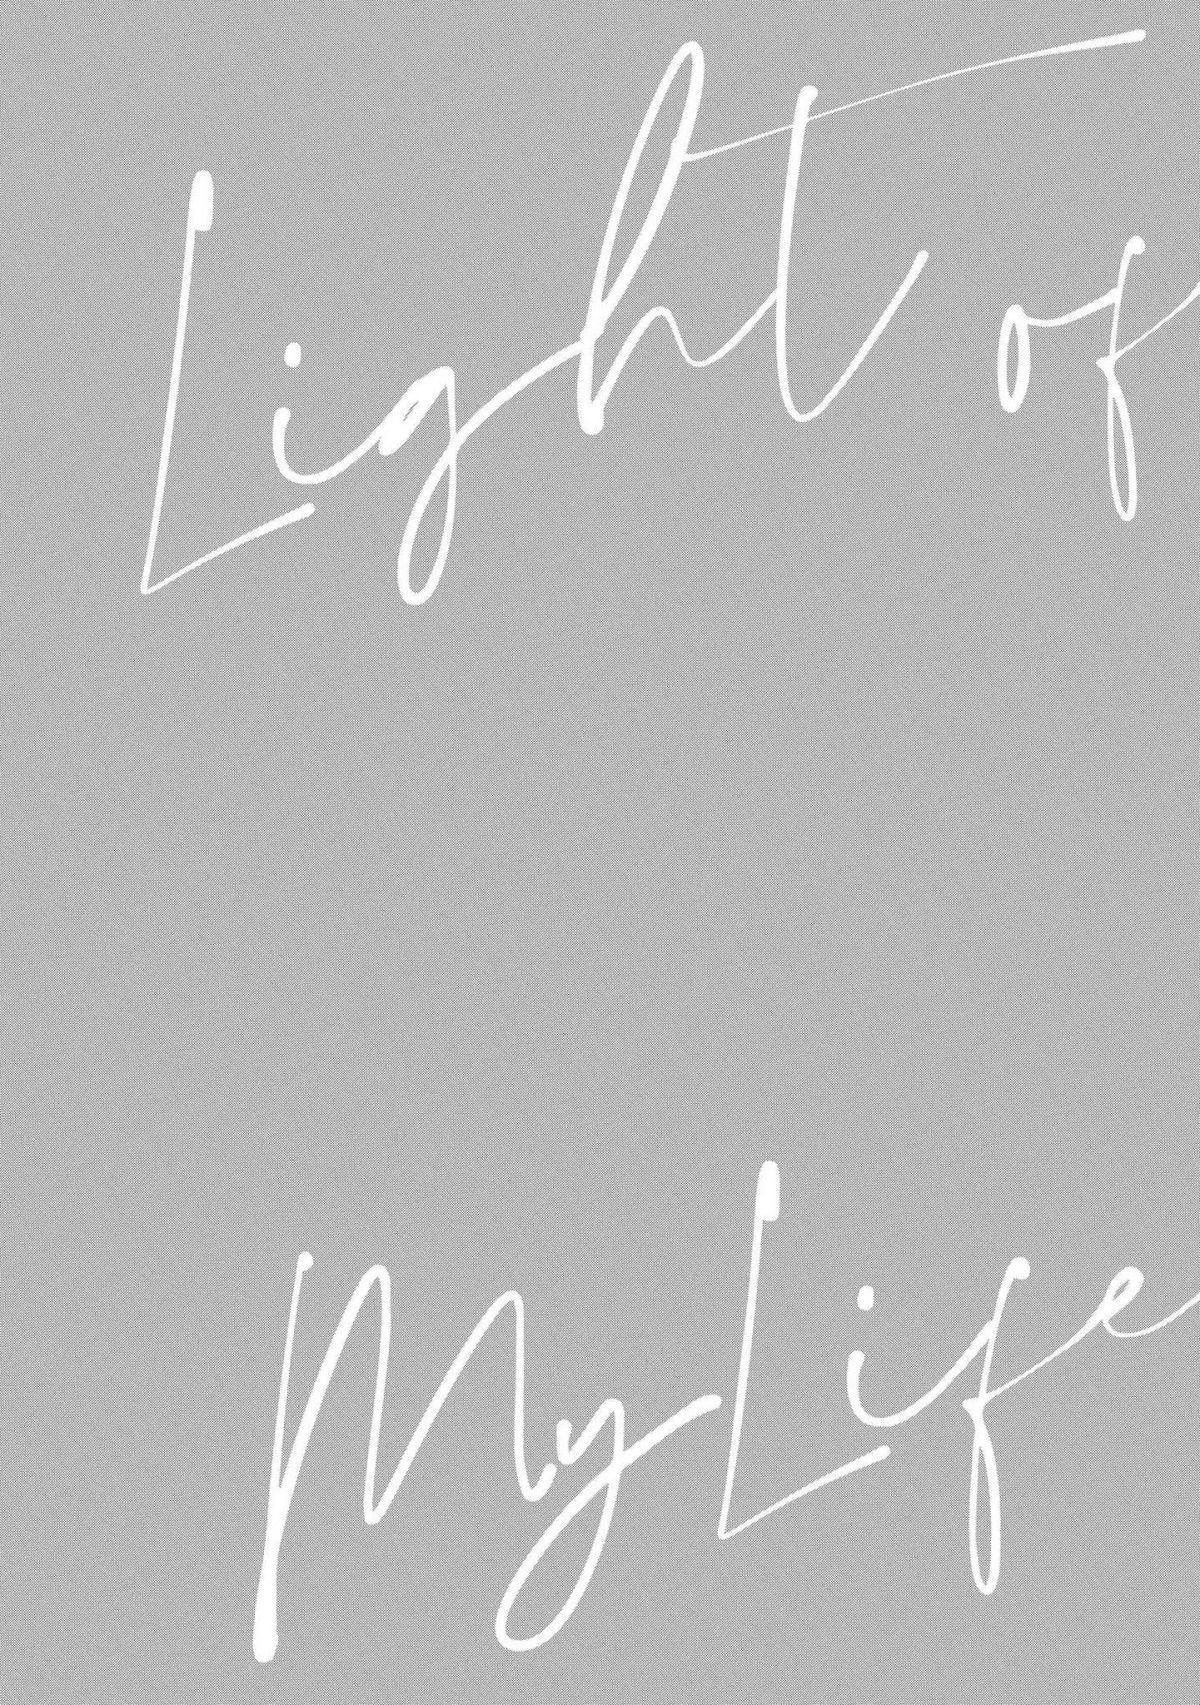 Light of my life | 生命之光 02-05 27